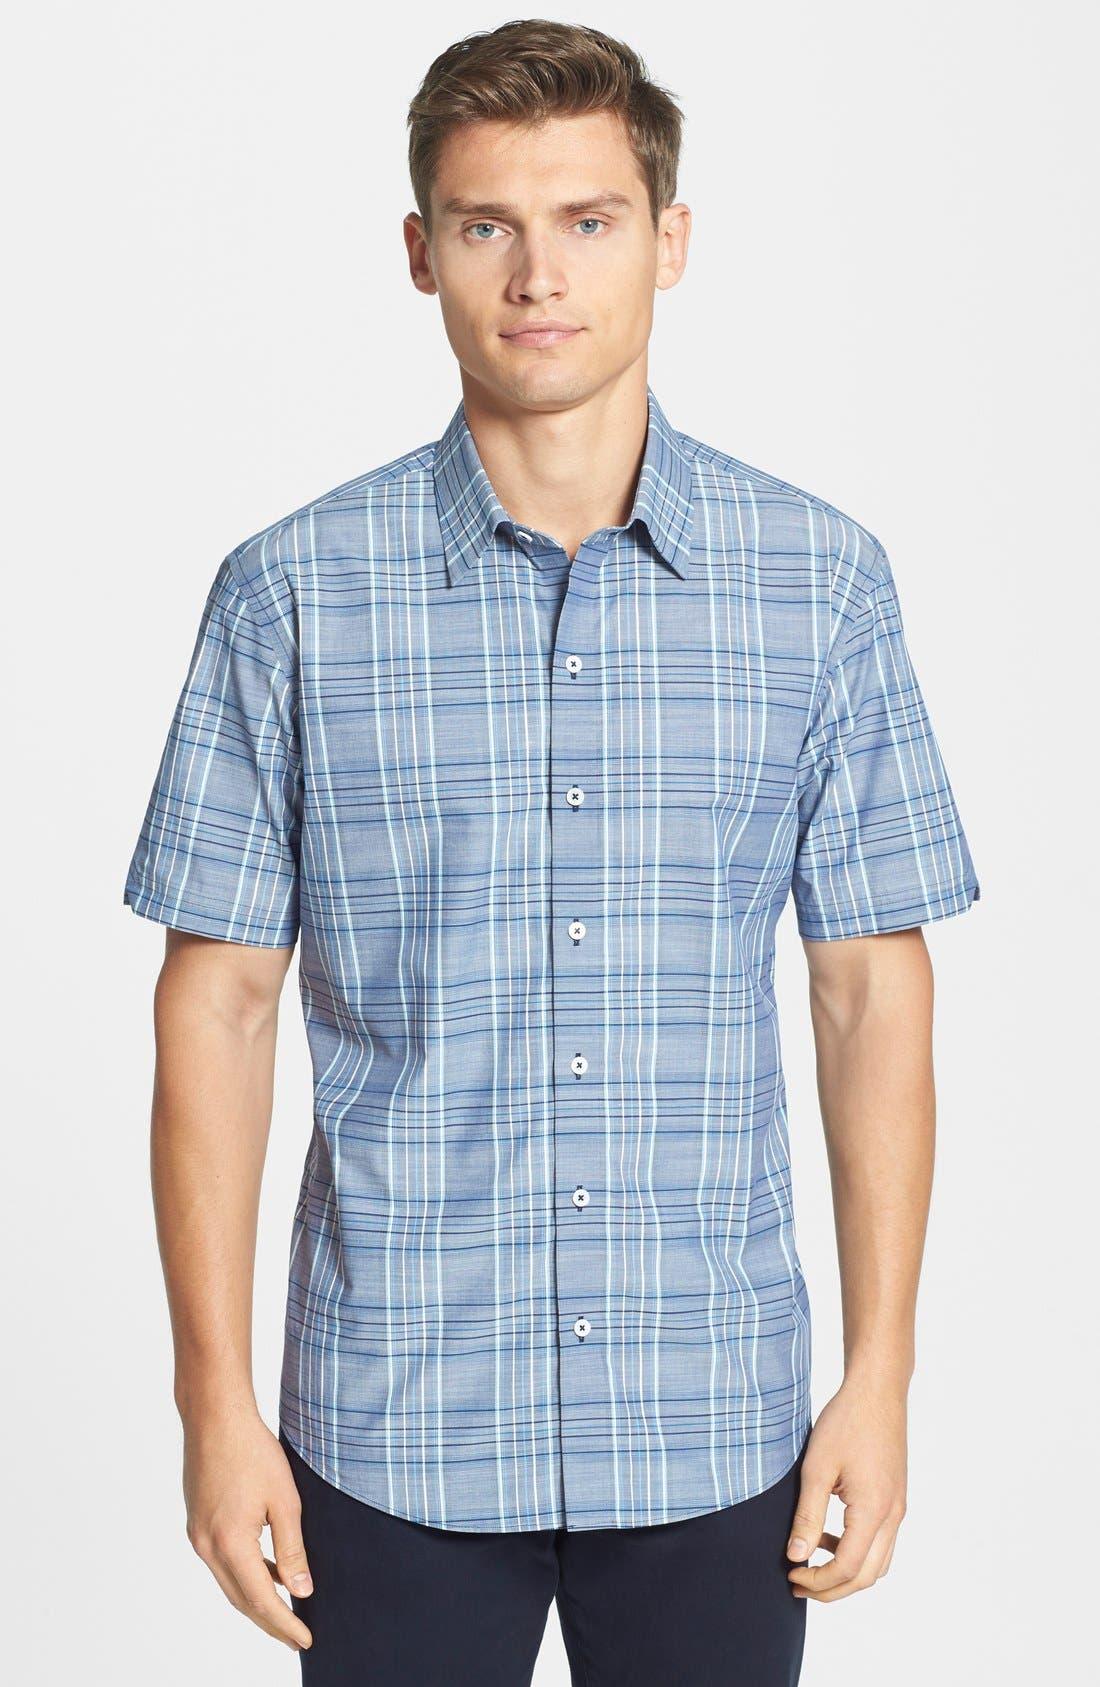 Alternate Image 1 Selected - Zachary Prell 'Deeb' Standard Fit Short Sleeve Windowpane Plaid Sport Shirt